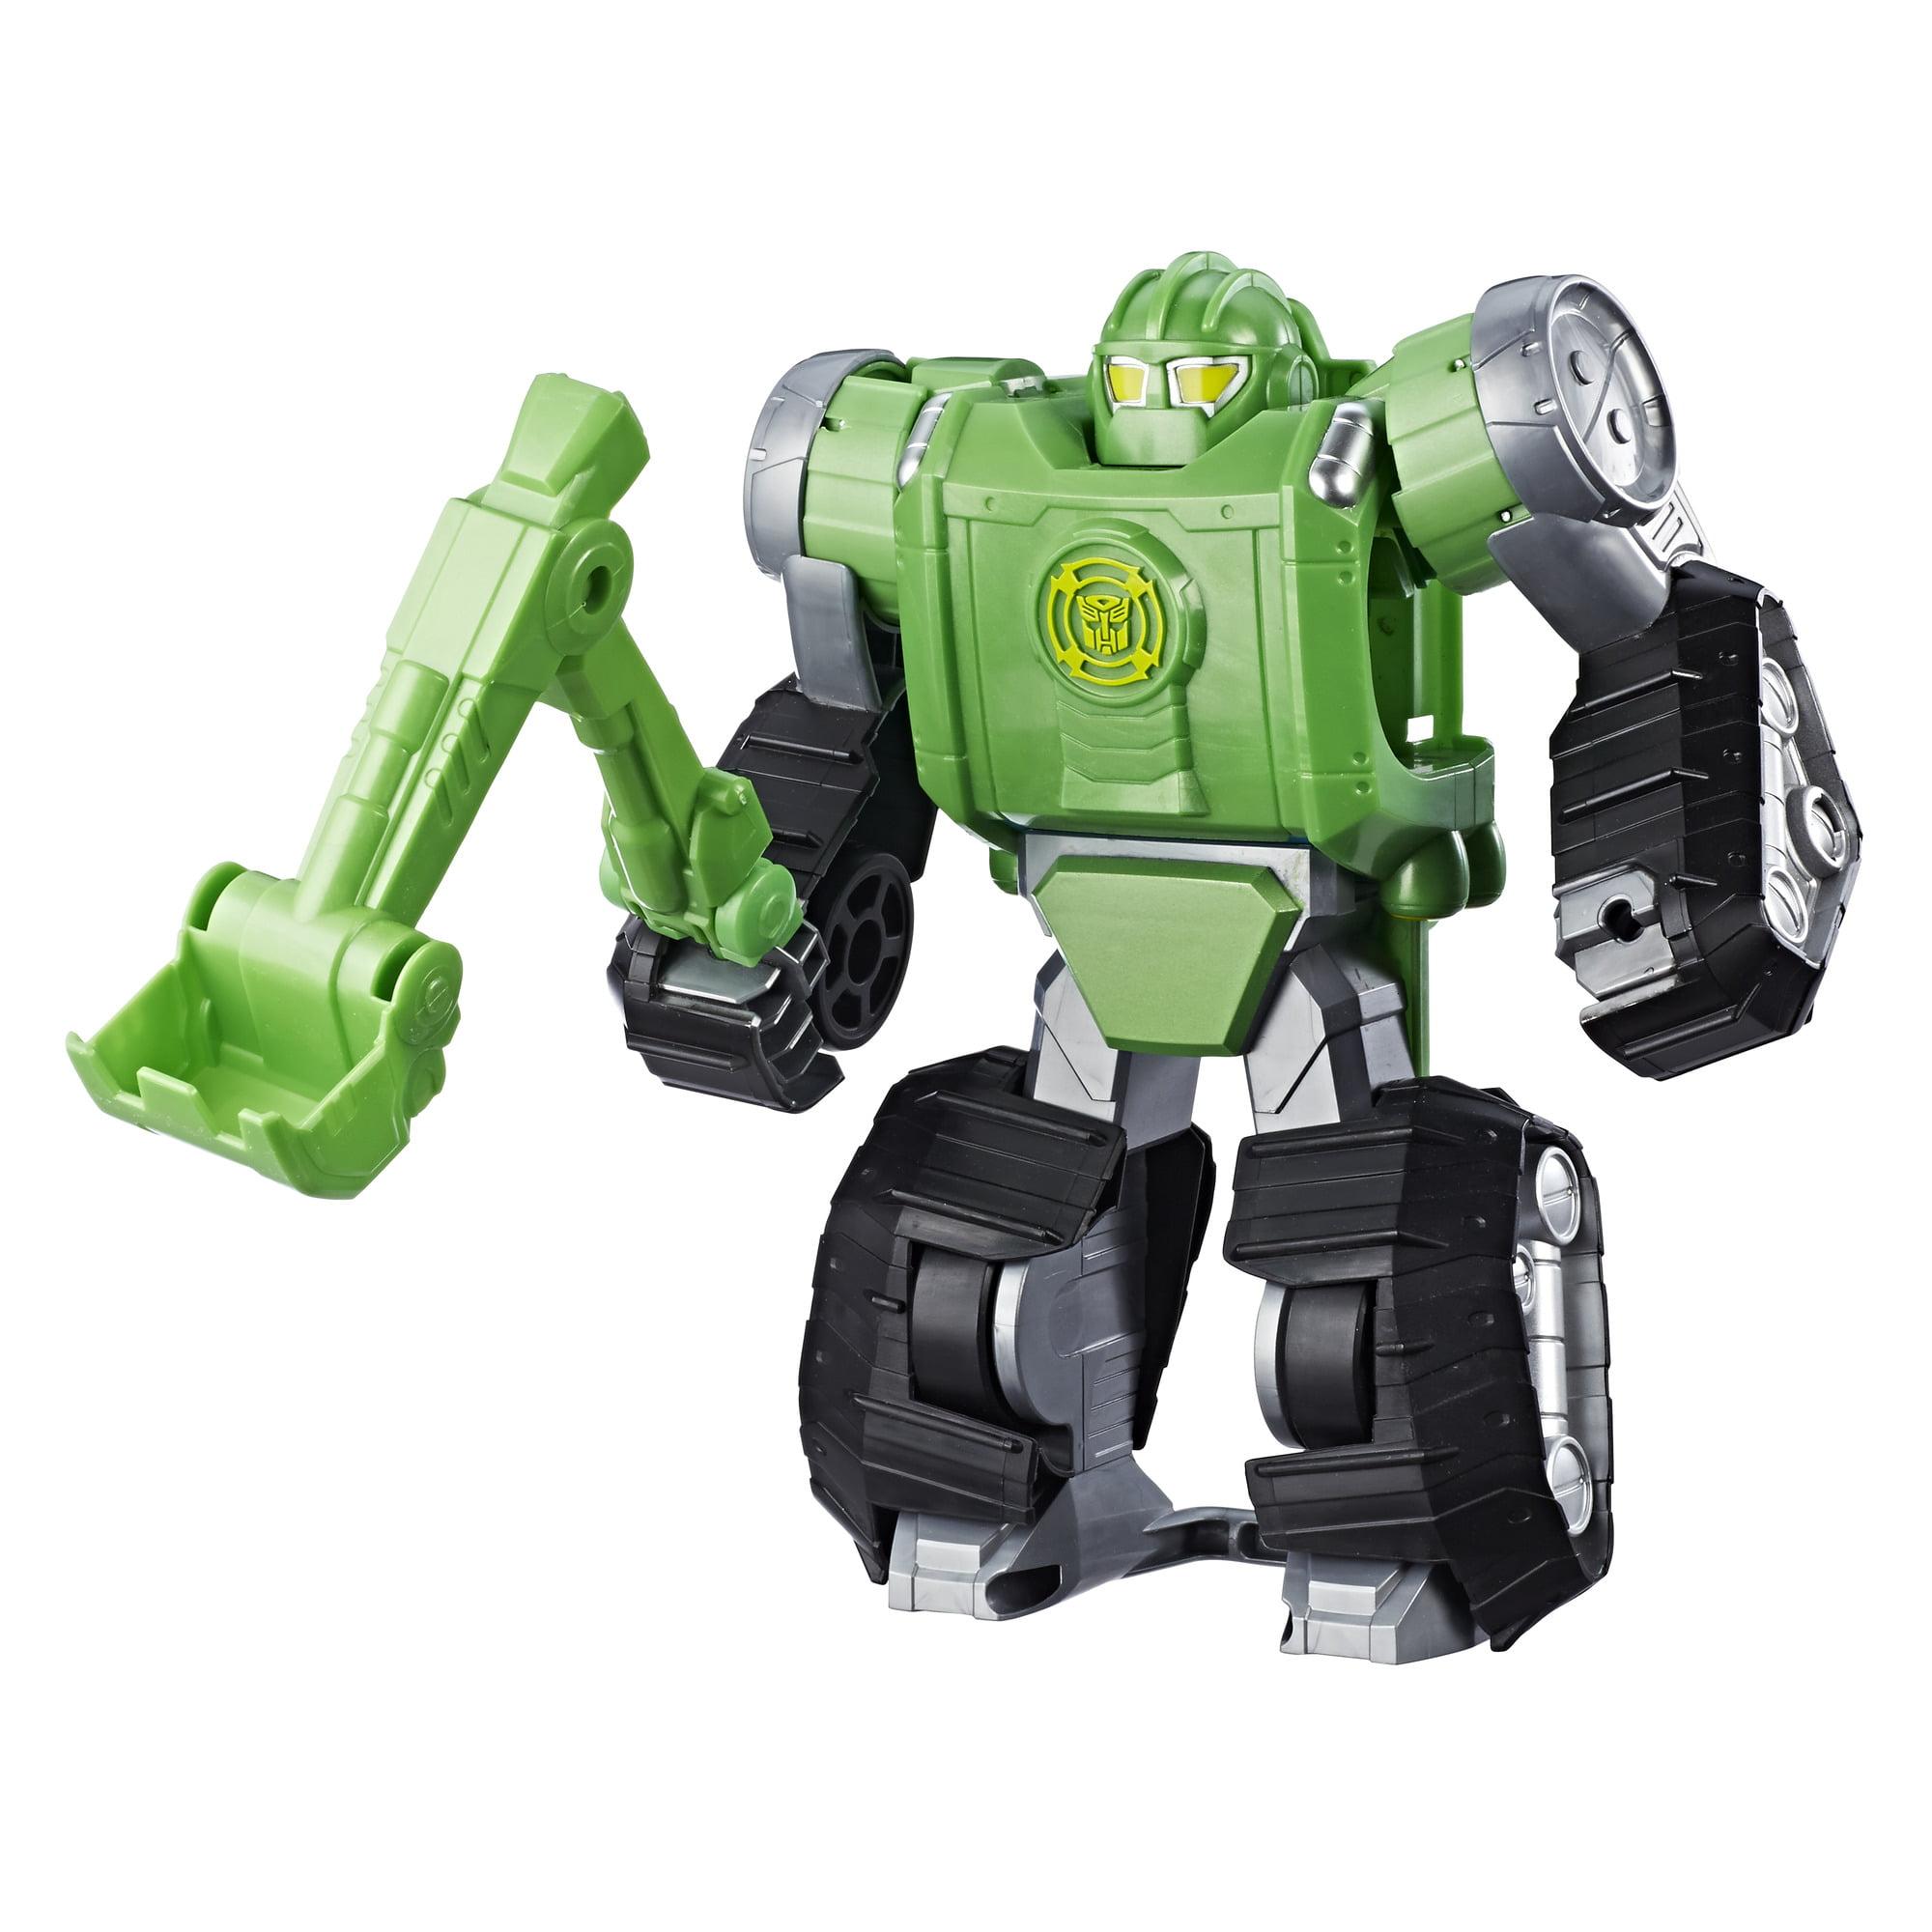 Transformers RESCUE BOTS PLAYSKOOL HEROES SILVERBACK THE GORILLA-BOT